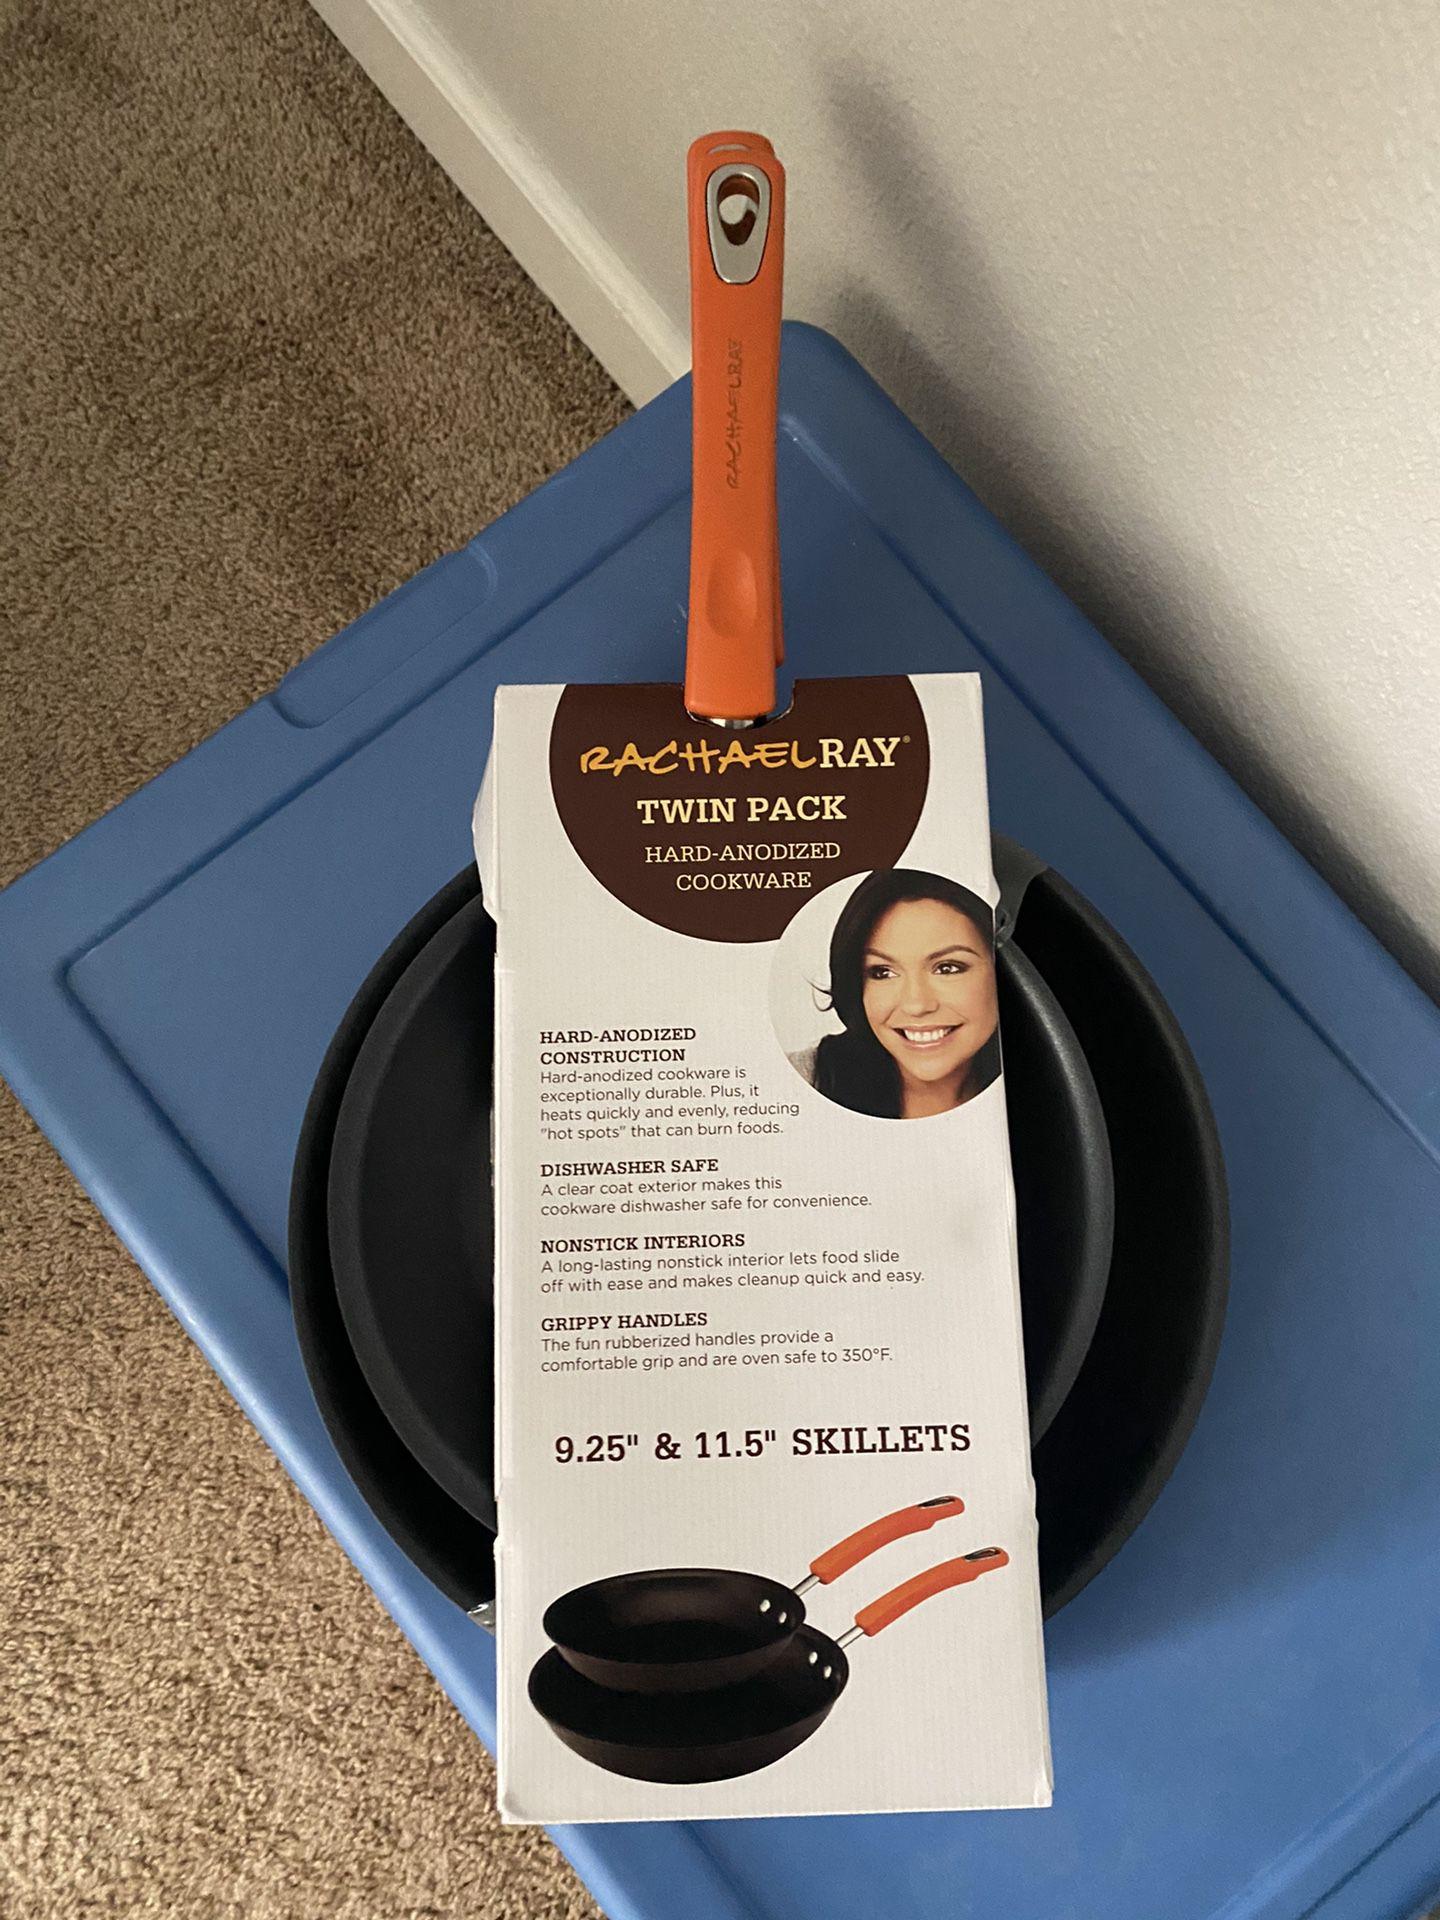 Brand new Rachael ray pan set.